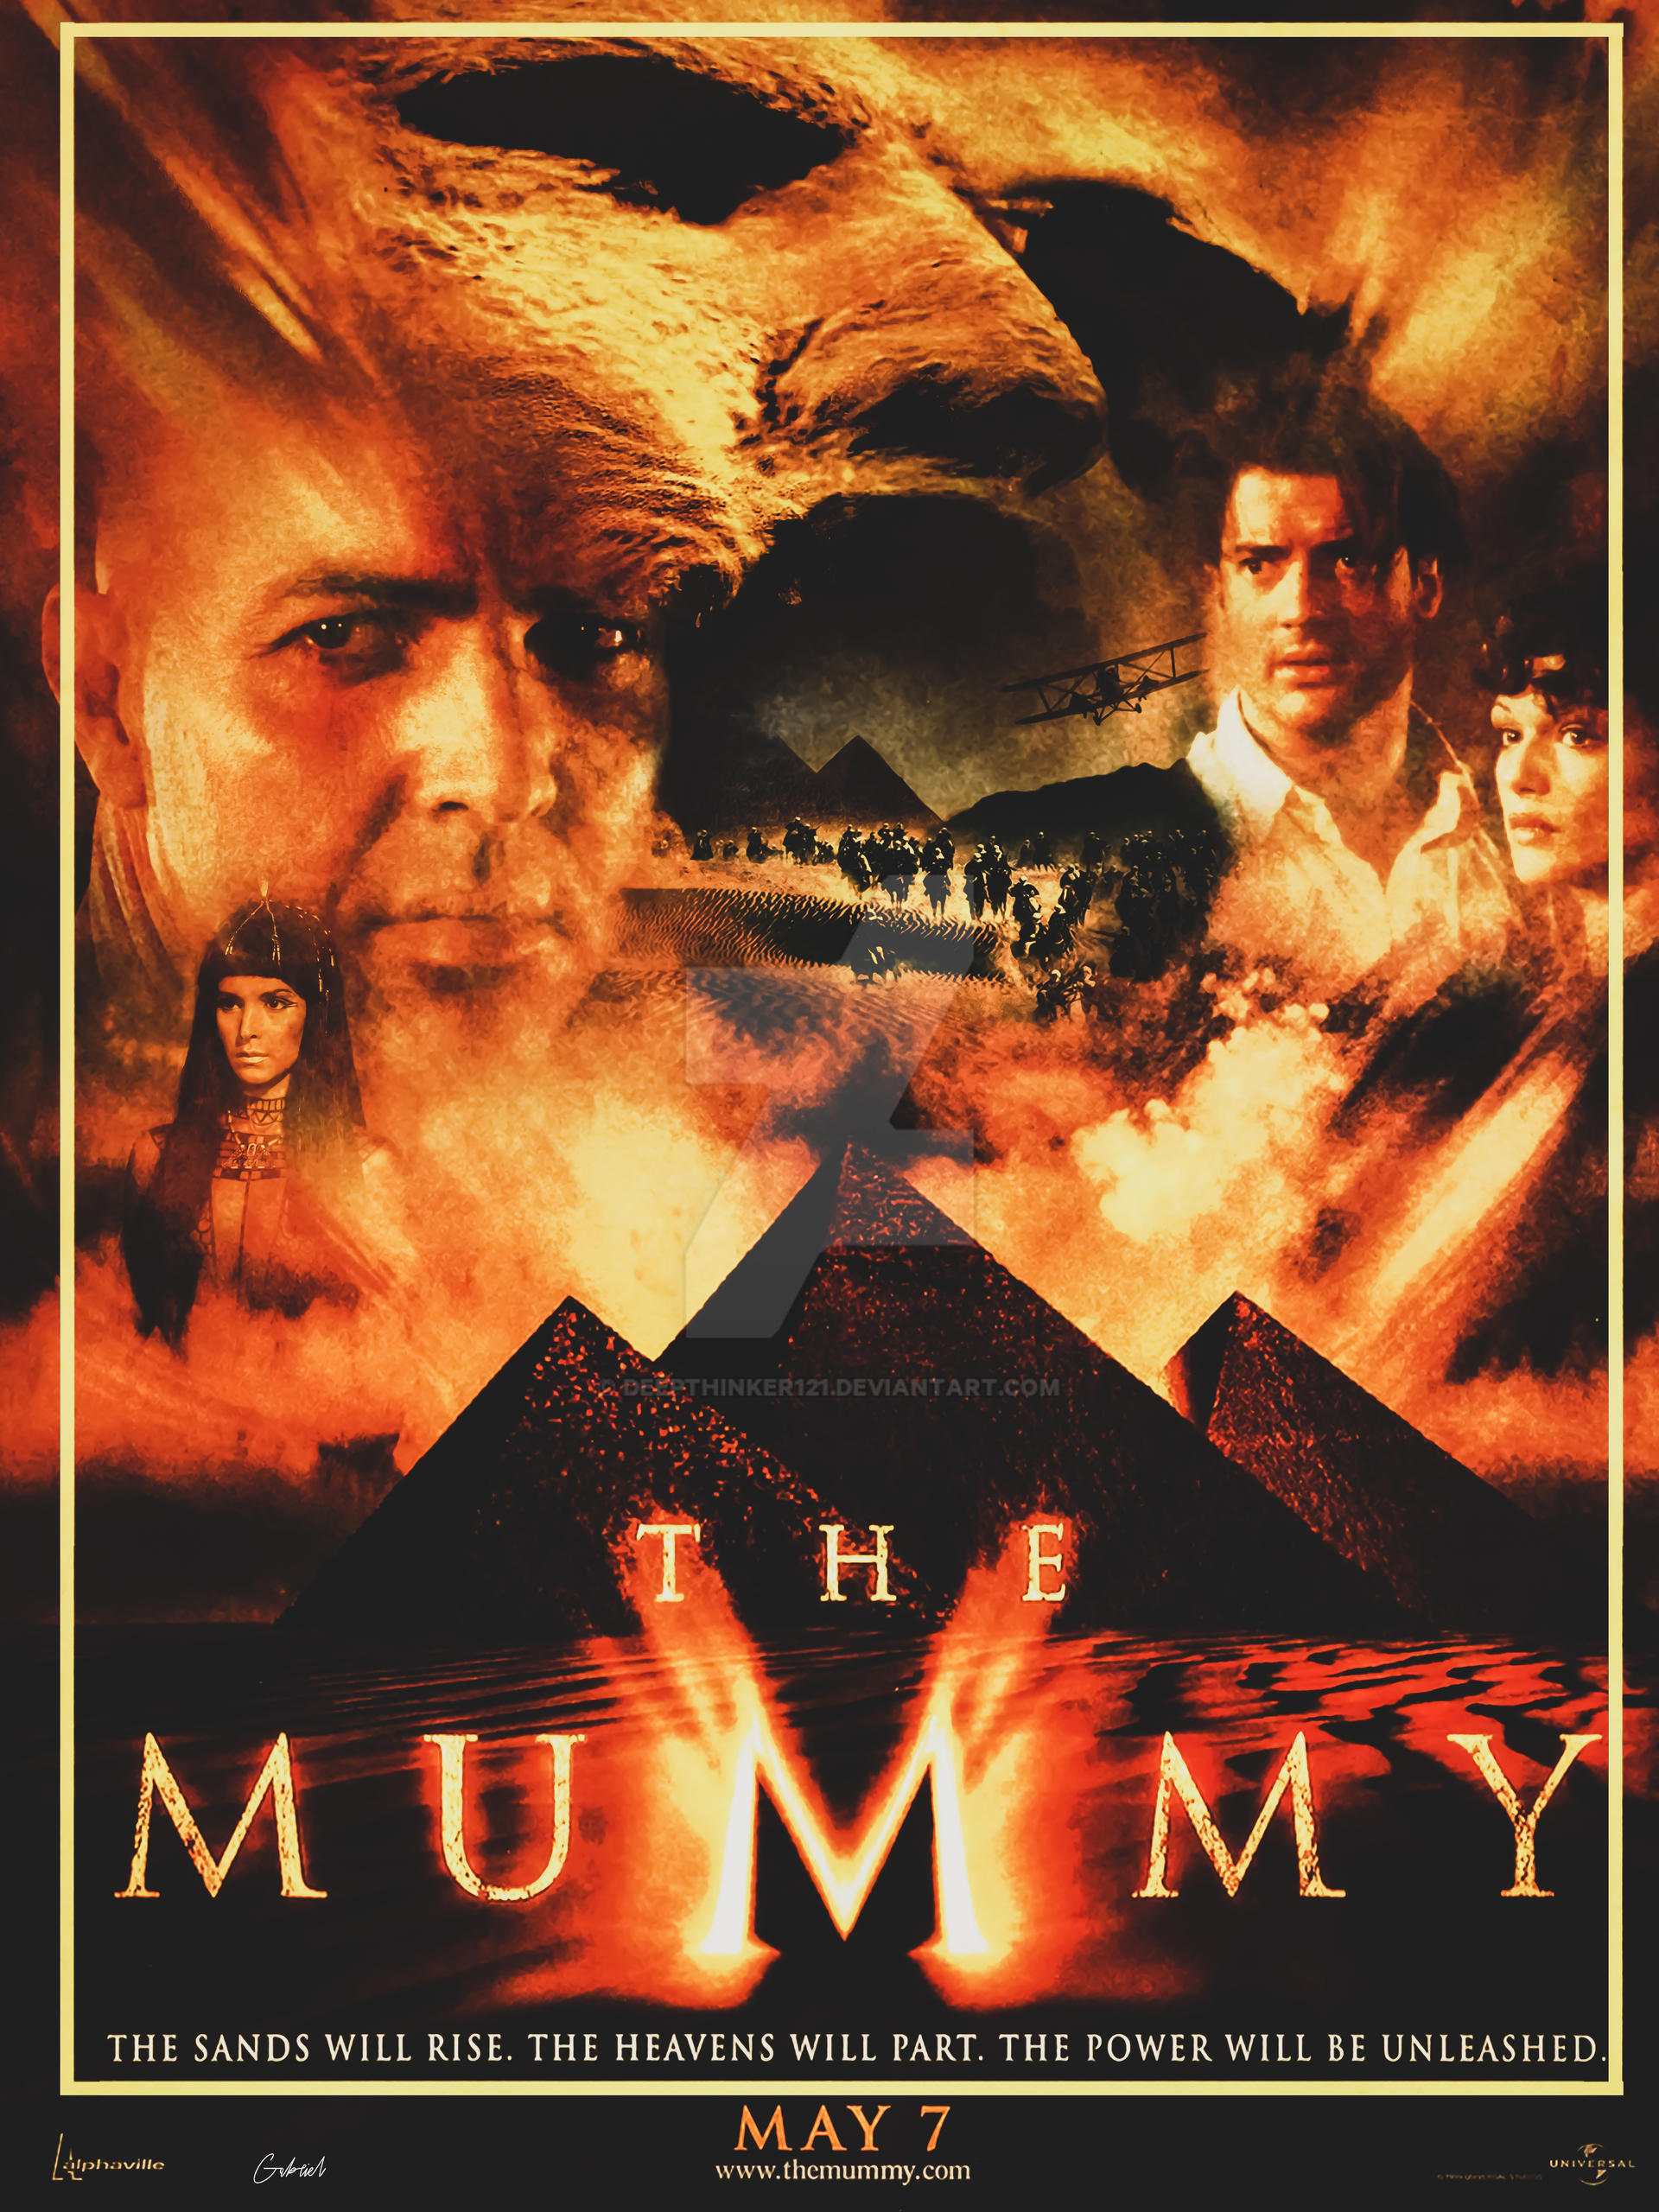 The Mummy 1999 Poster By Deepthinker121 On Deviantart